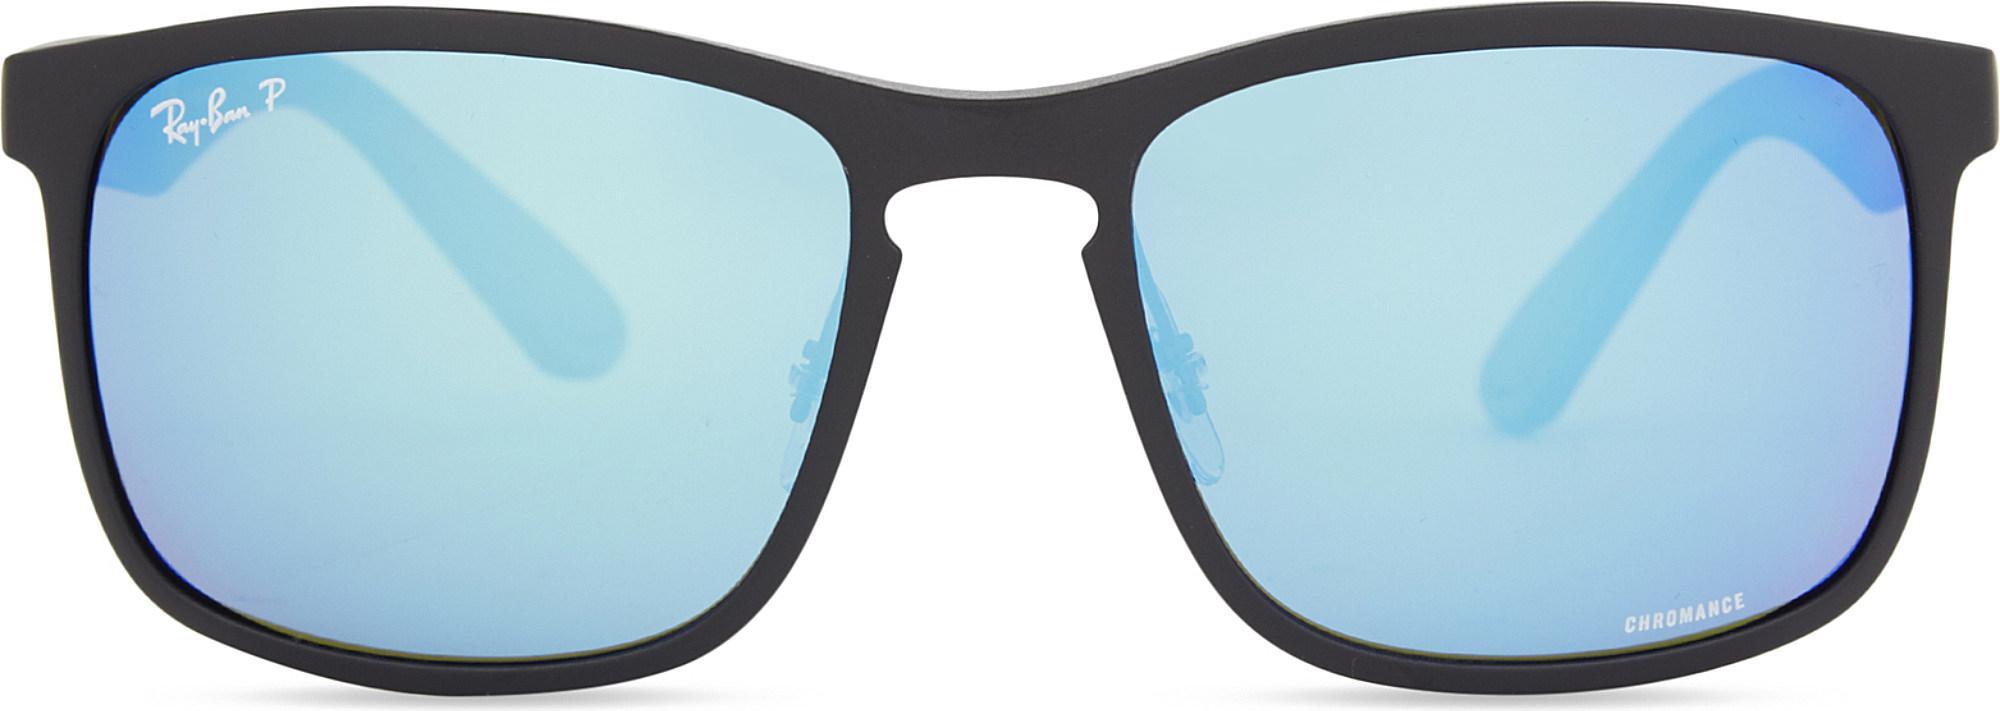 2c217e4a8609e Lyst - Ray-Ban Rb4264 Square-frame Sunglasses in Black